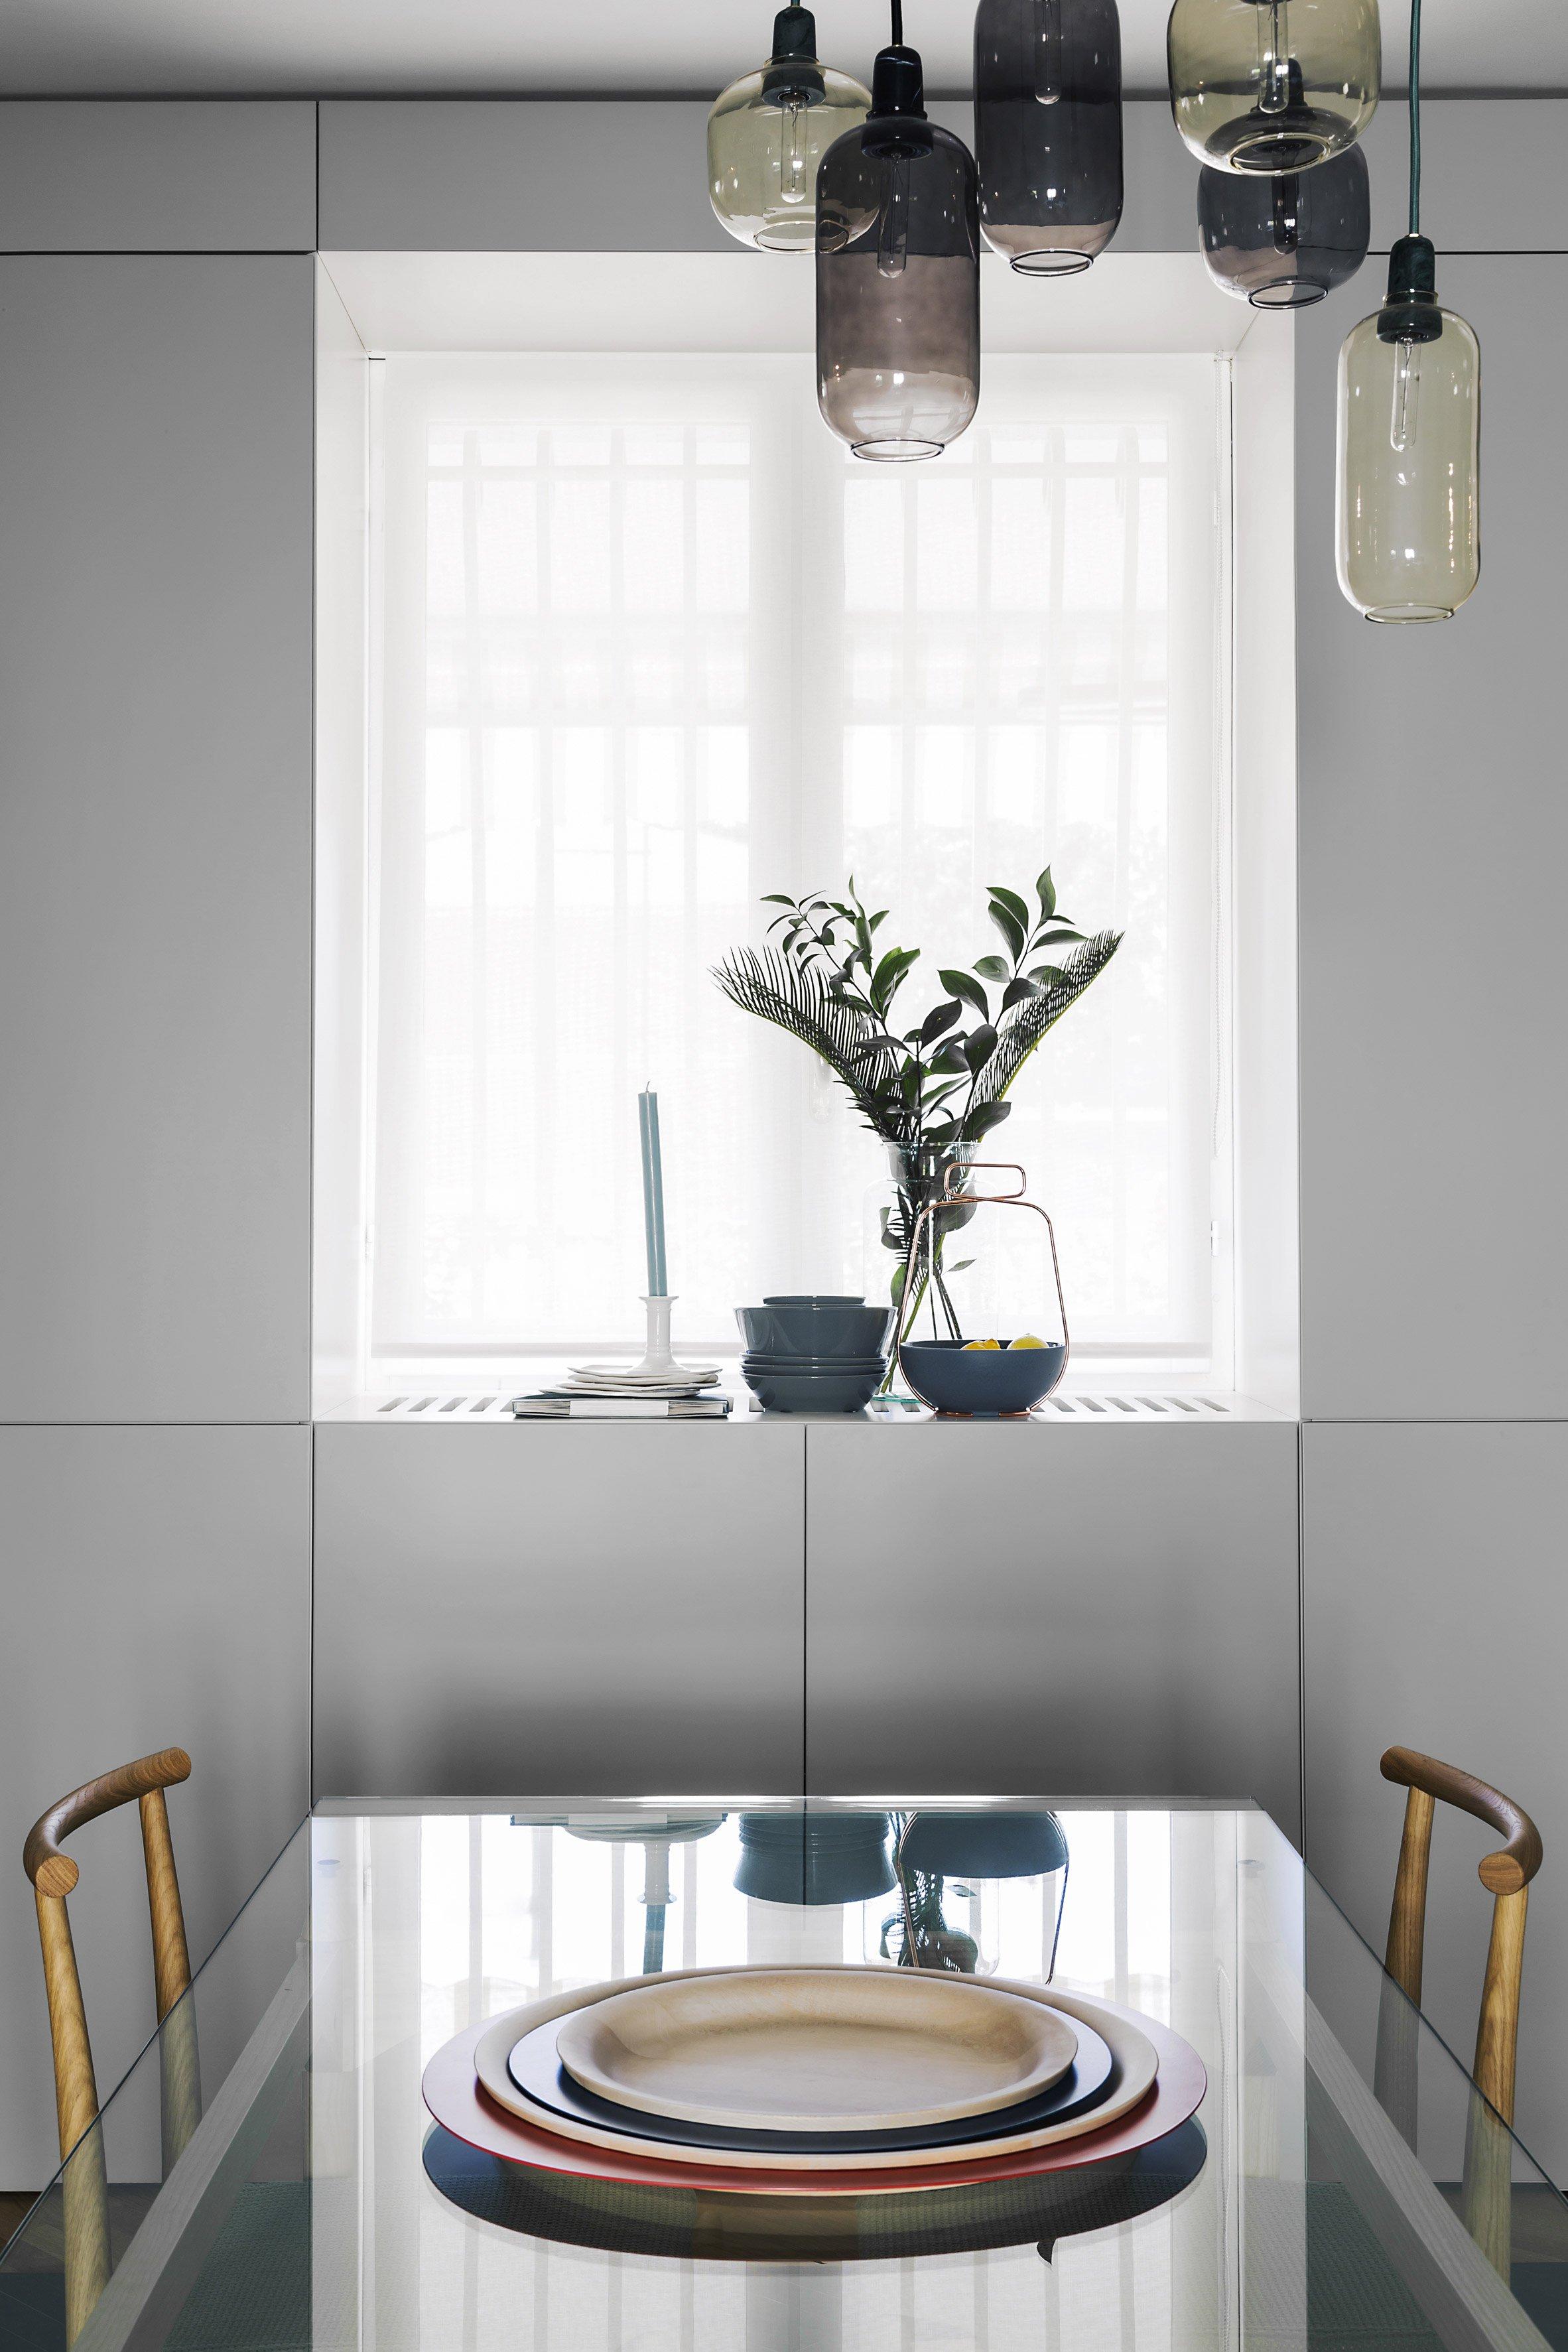 architecture-house-residential-design-studia-interiors-osnovadesign-osnova-poltava_14